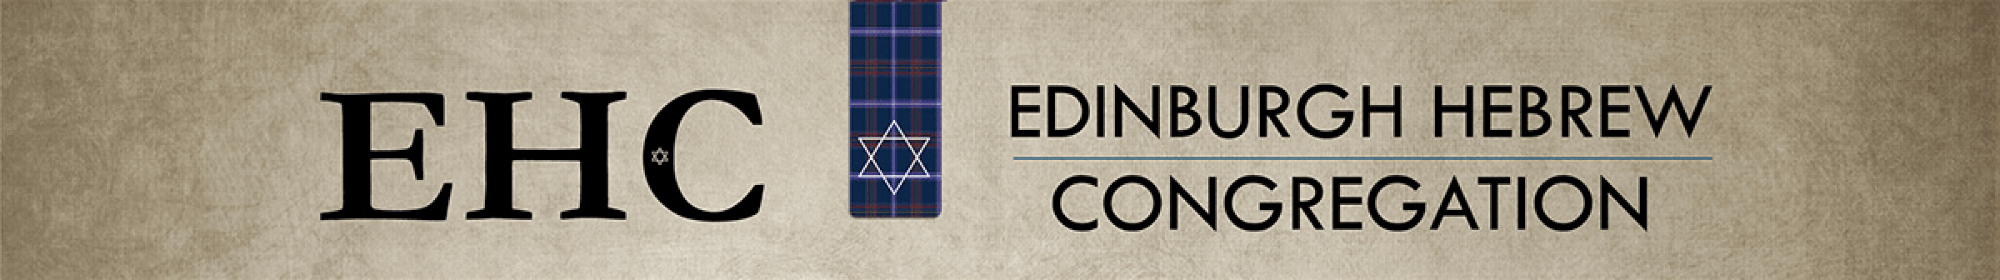 EHC – Edinburgh Hebrew Congregation